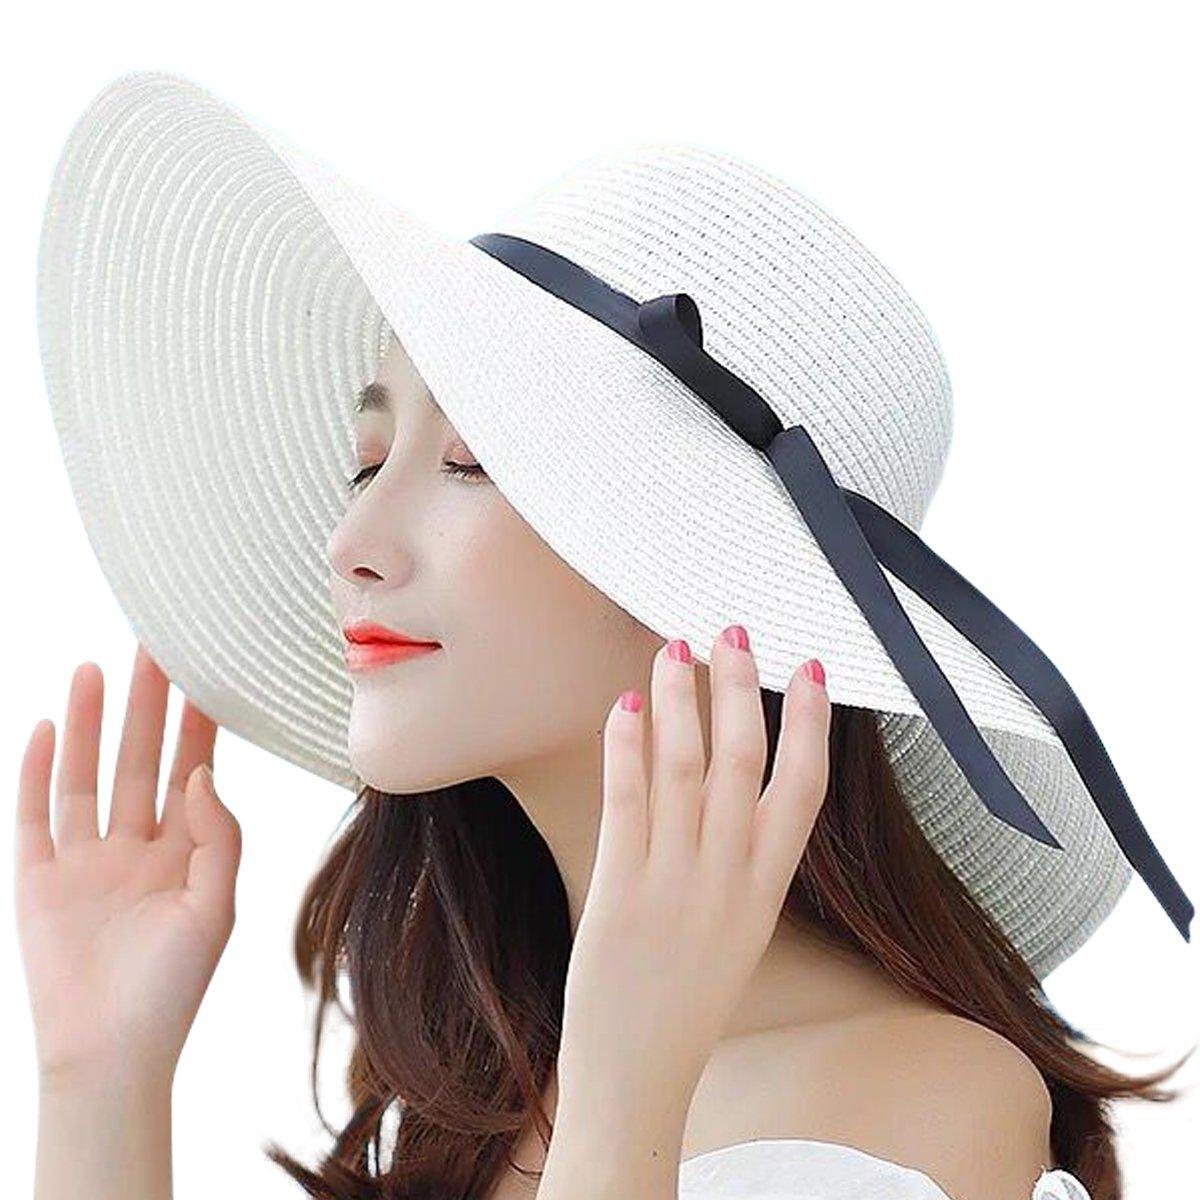 be79a3f08aa9e1 Galleon - JOYEBUY Women's Floppy Big Brim Hat Bowknot Straw Hat Foldable  Roll Up Sun Hat (Style C-Milky White)